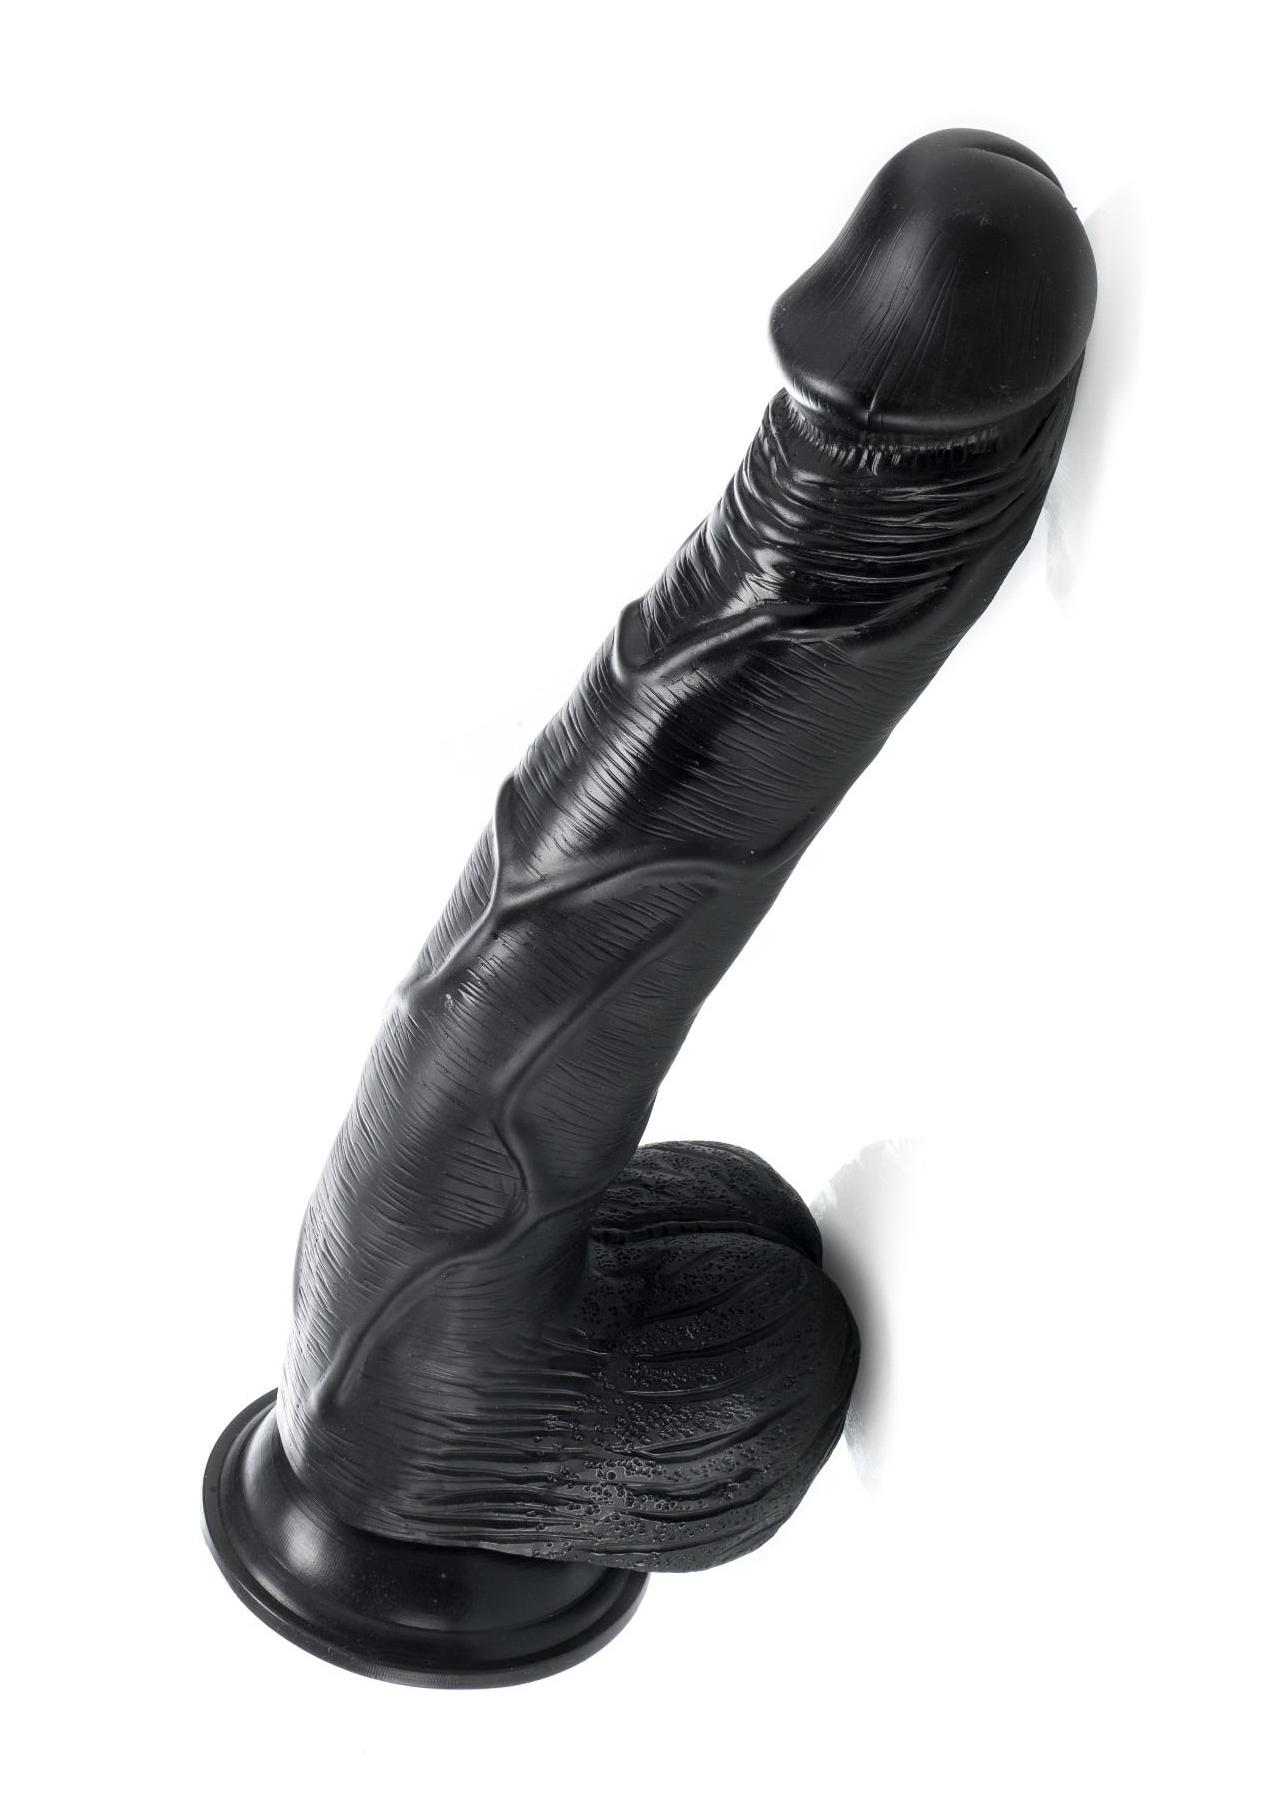 ZENN: John's Dick - Dildo black (35 x 6,0 cm)